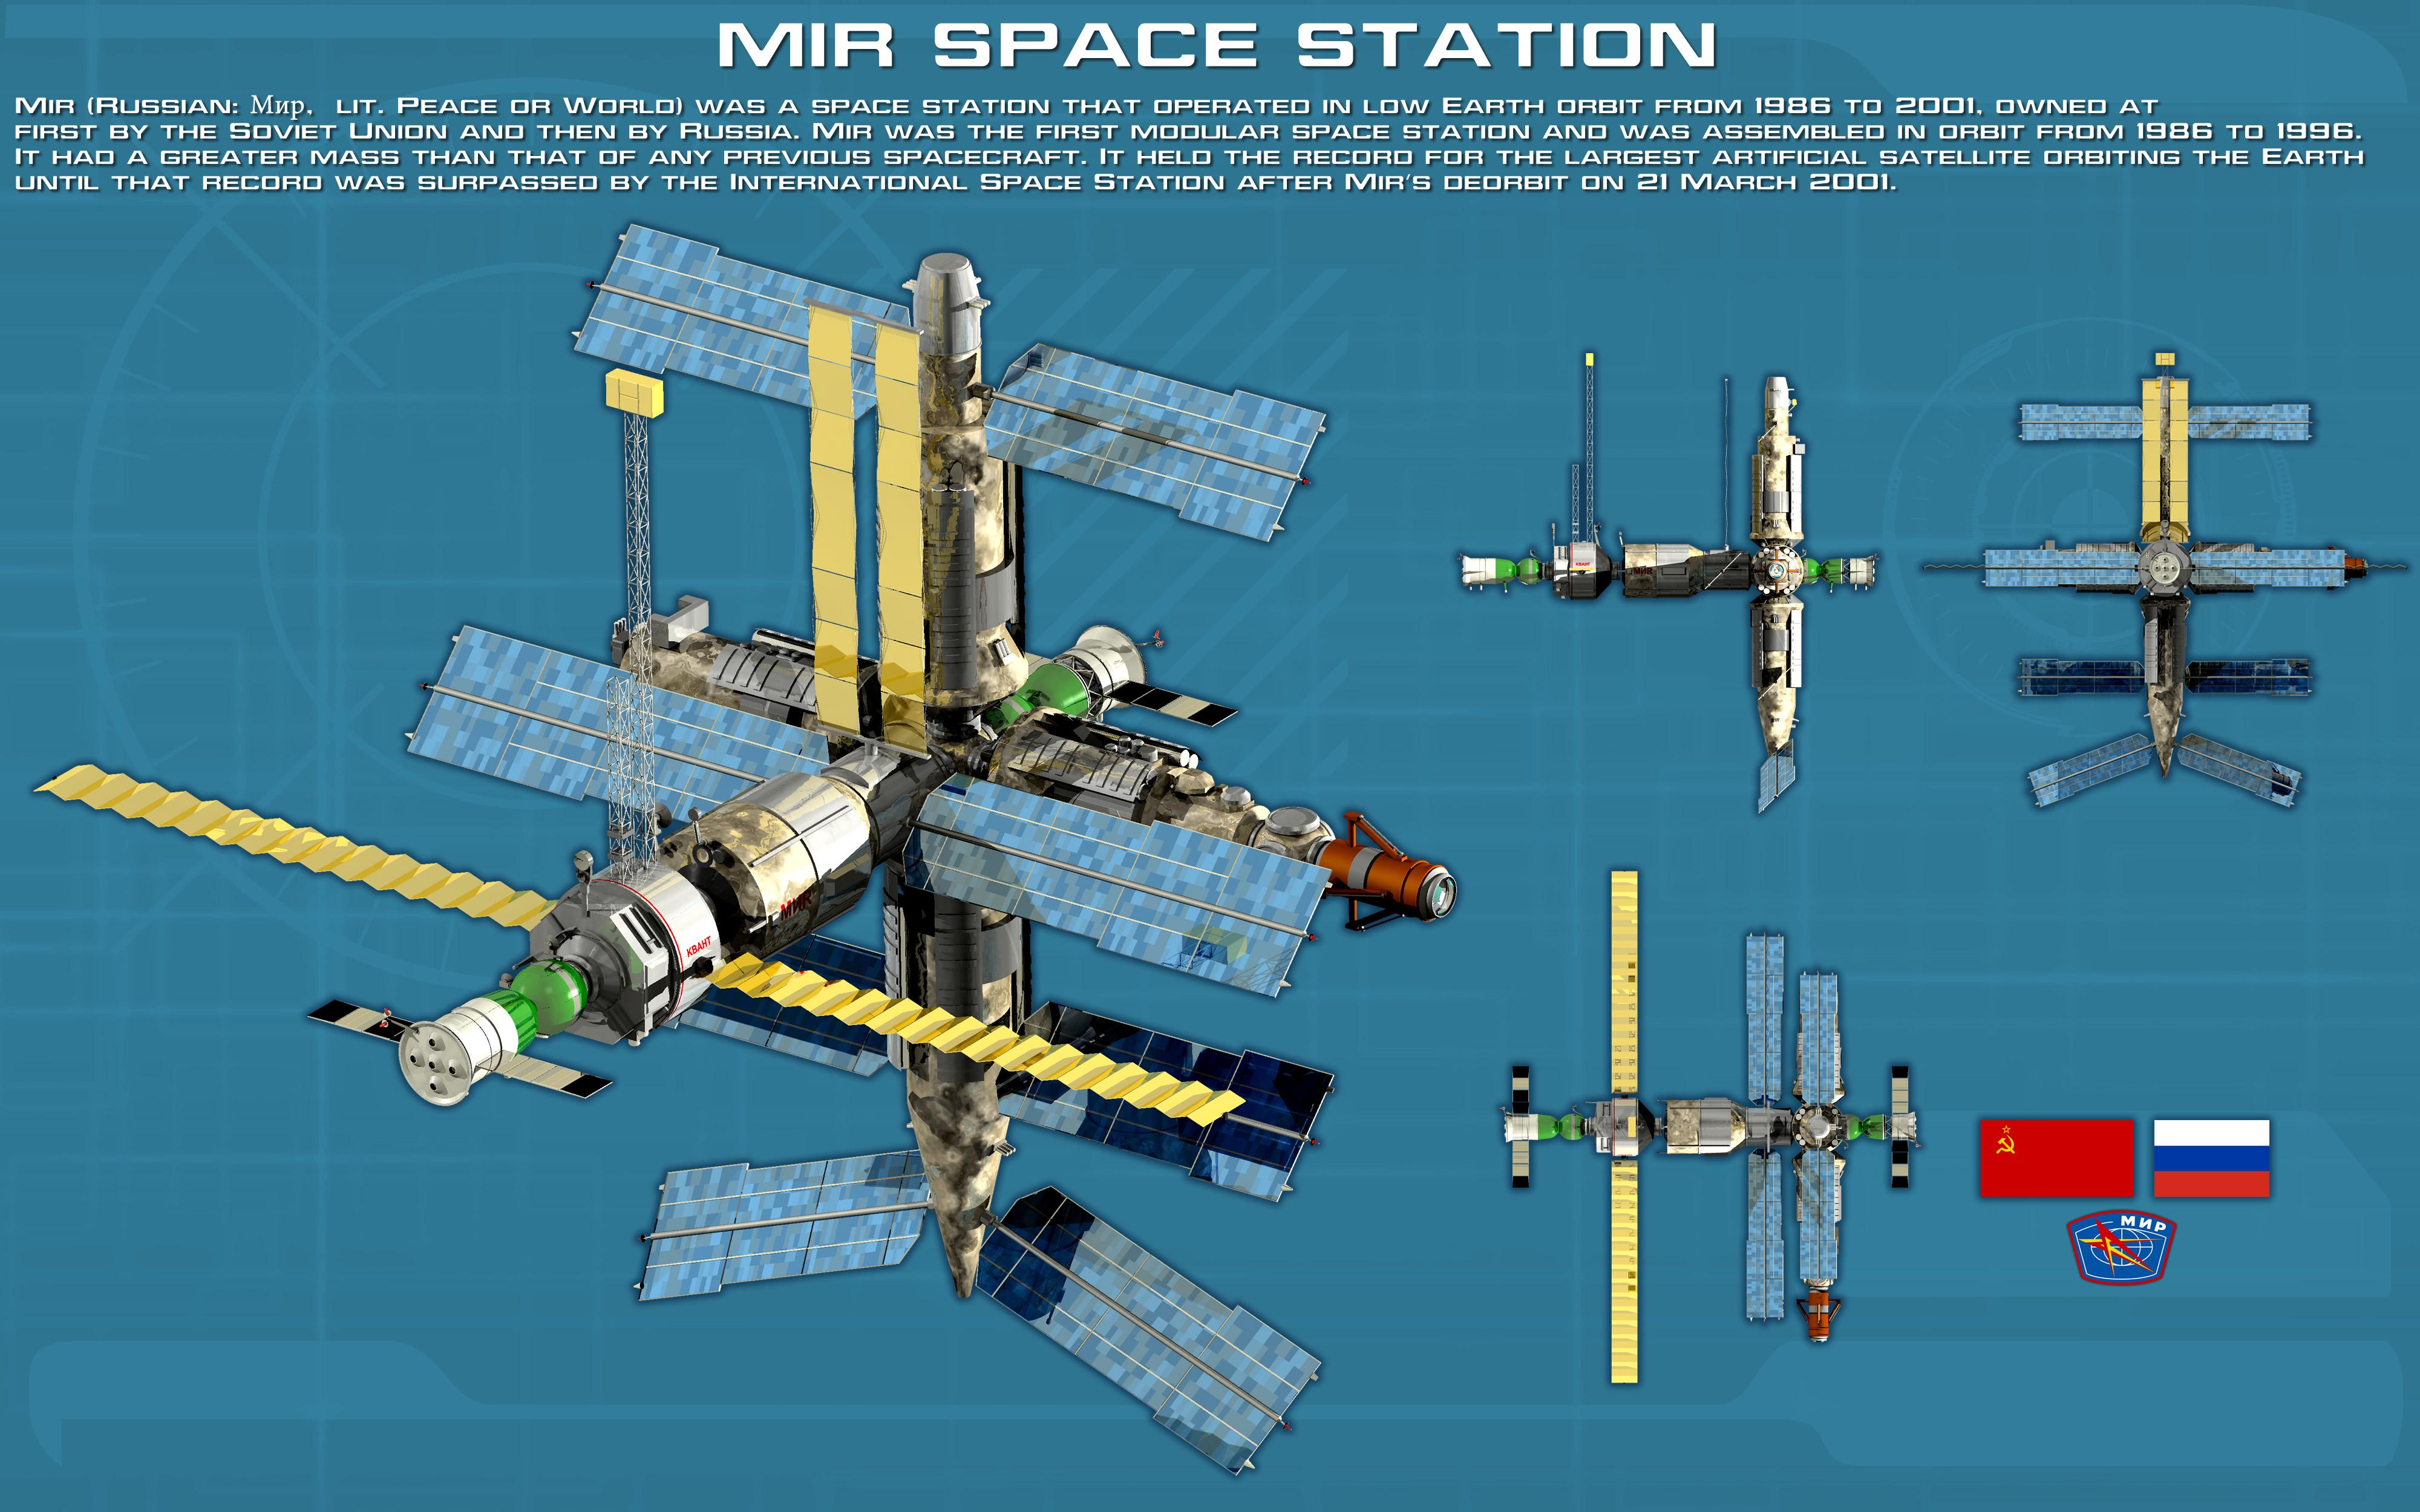 russian mir space station crash - photo #25